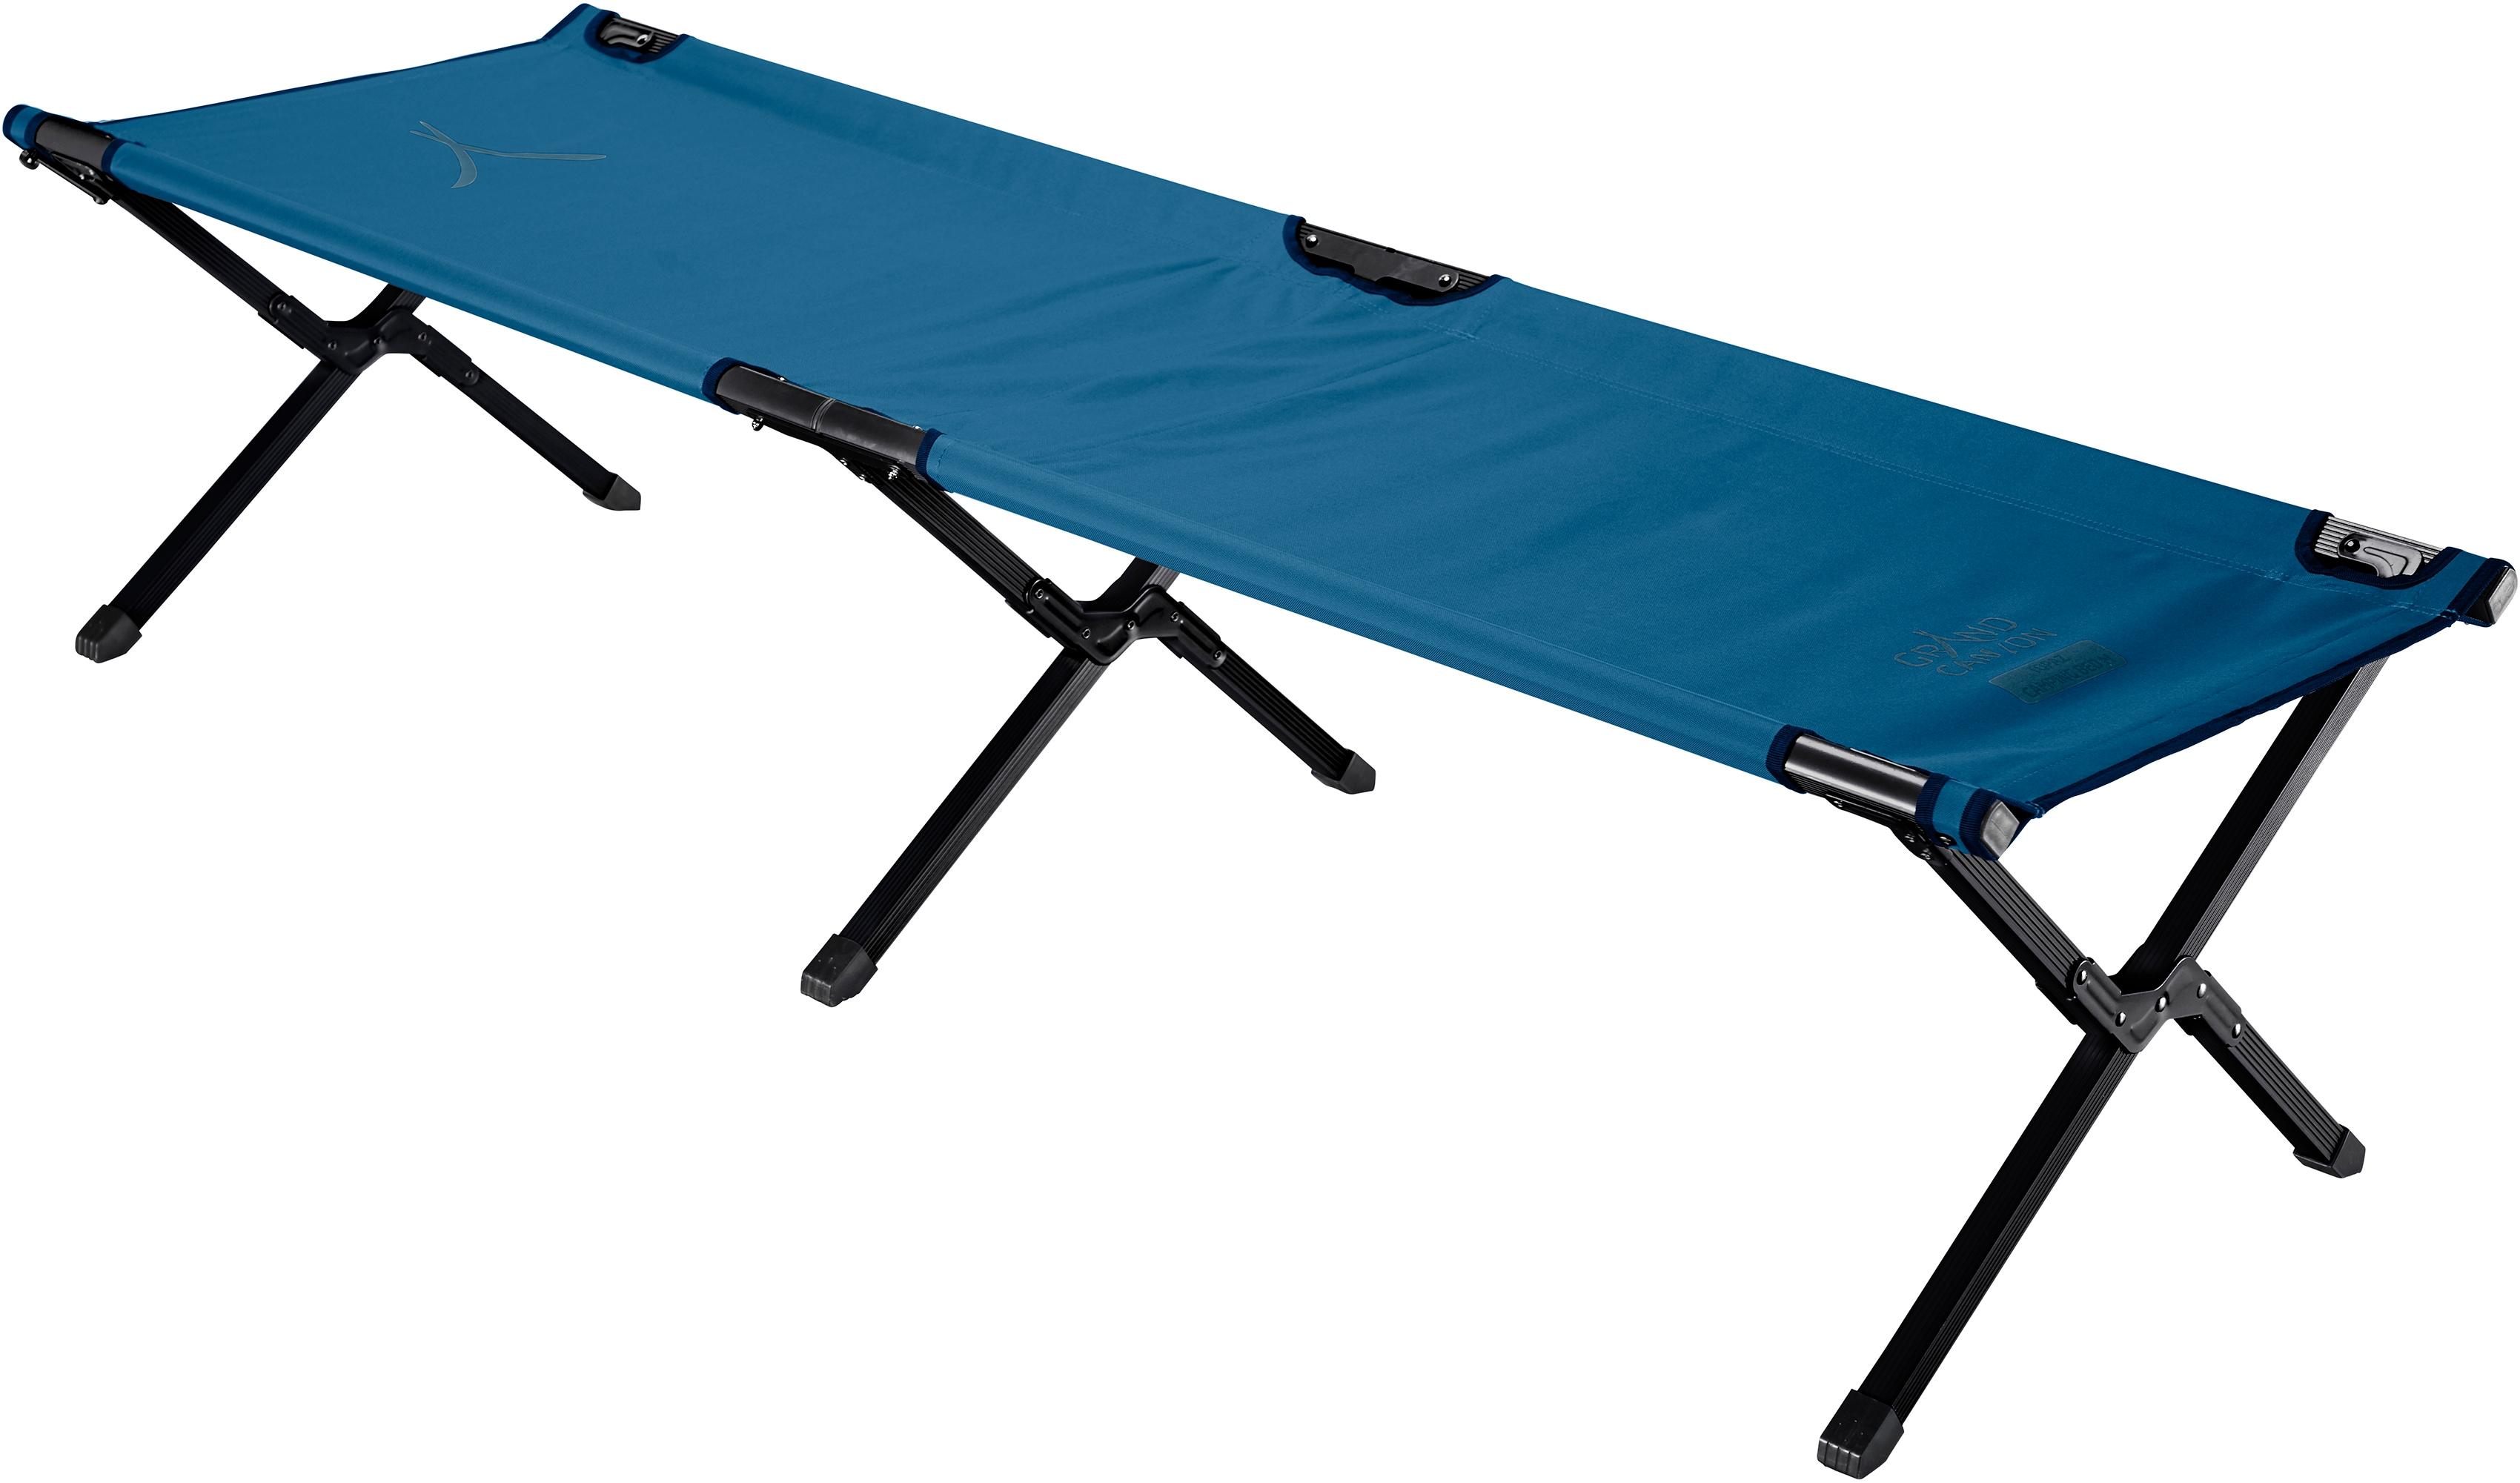 GRAND CANYON Feldbett TOPAZ CAMPING BED blau Campingmöbel Camping Schlafen Outdoor